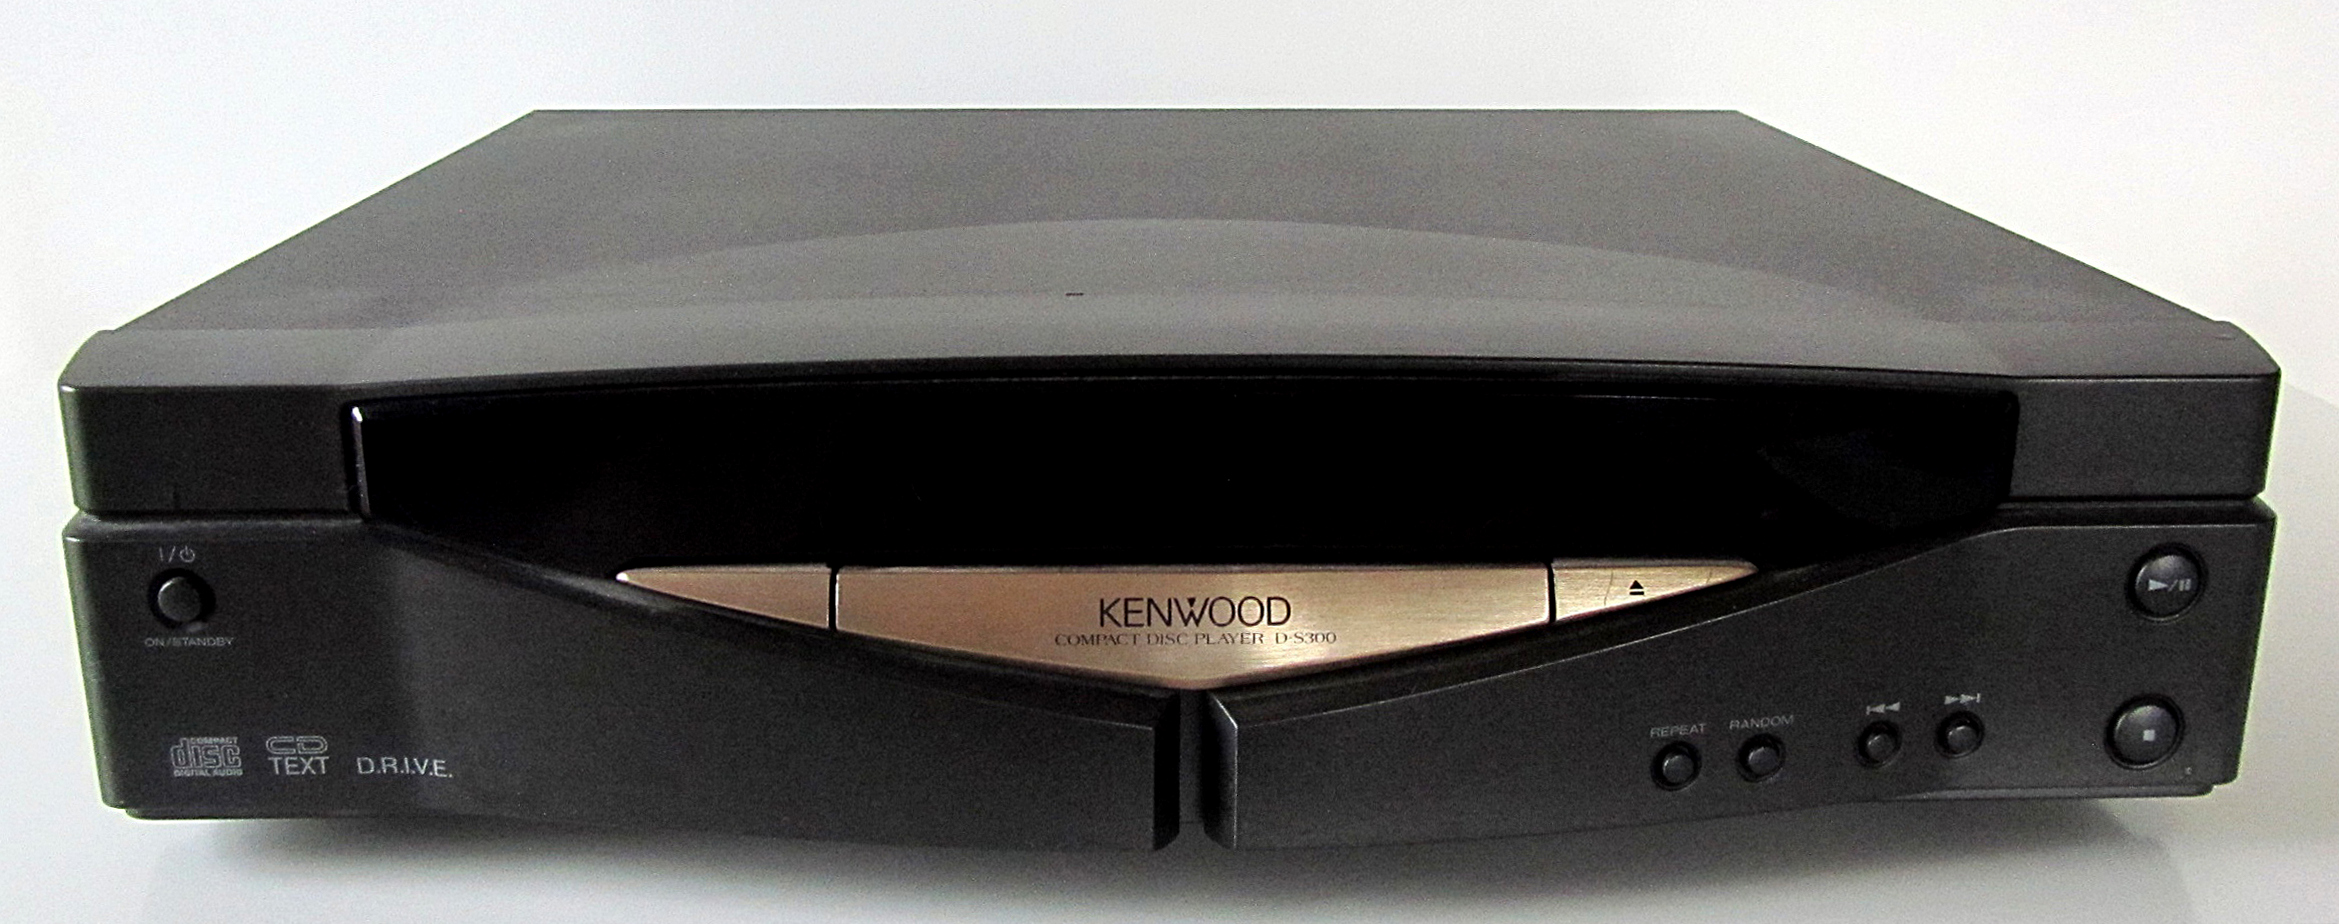 Kenwood D